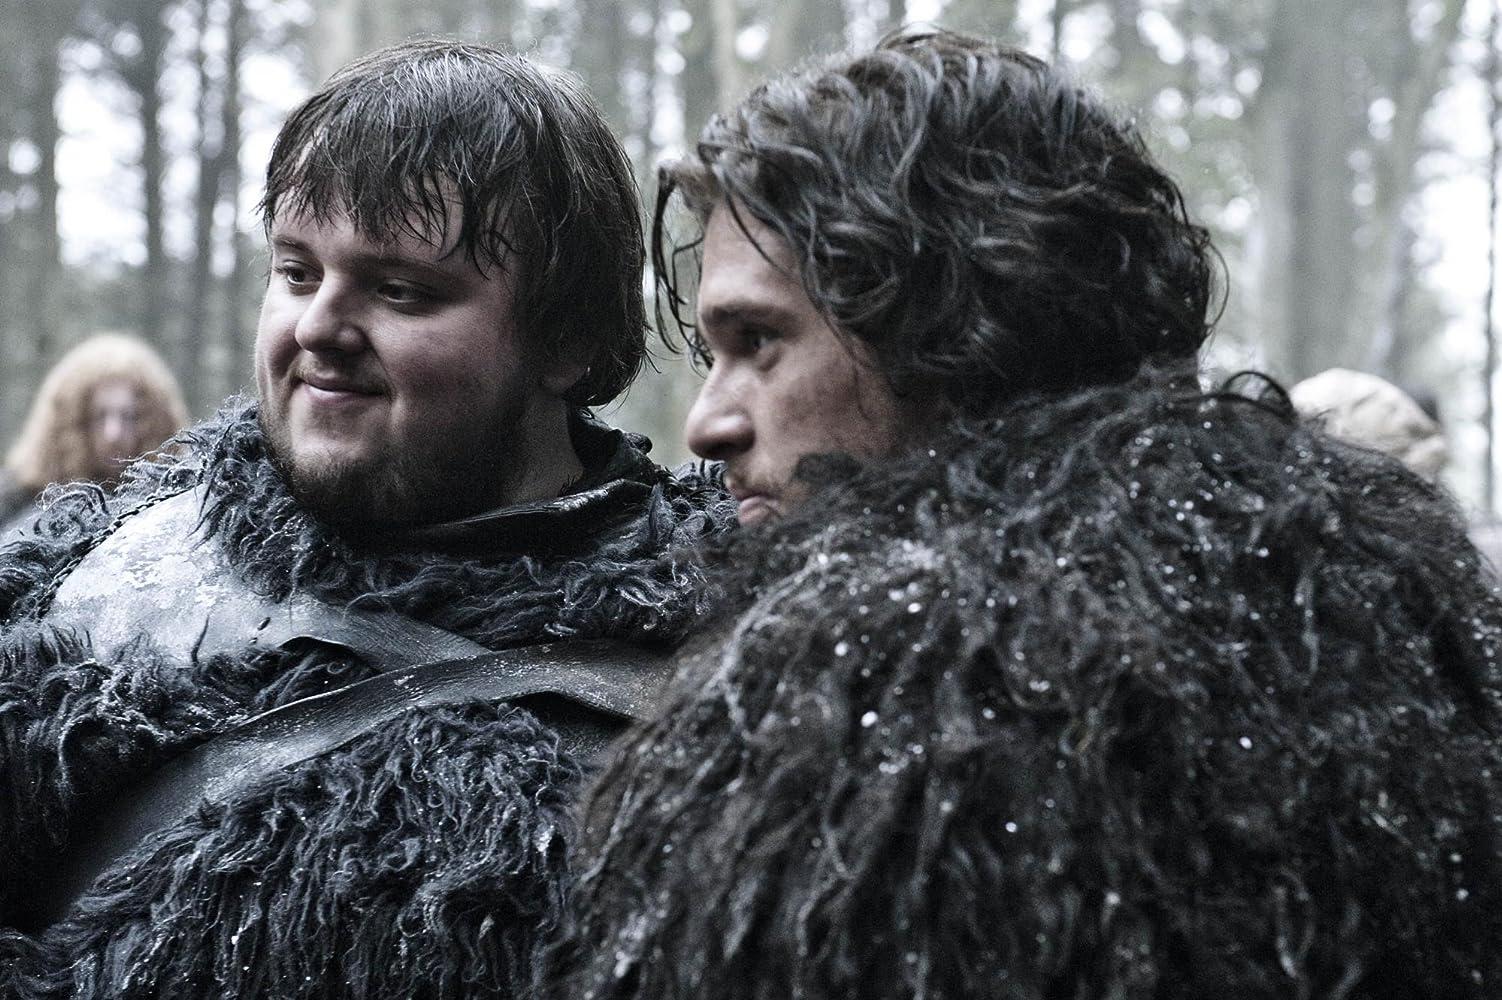 Kit Harington and John Bradley in Game of Thrones (2011)